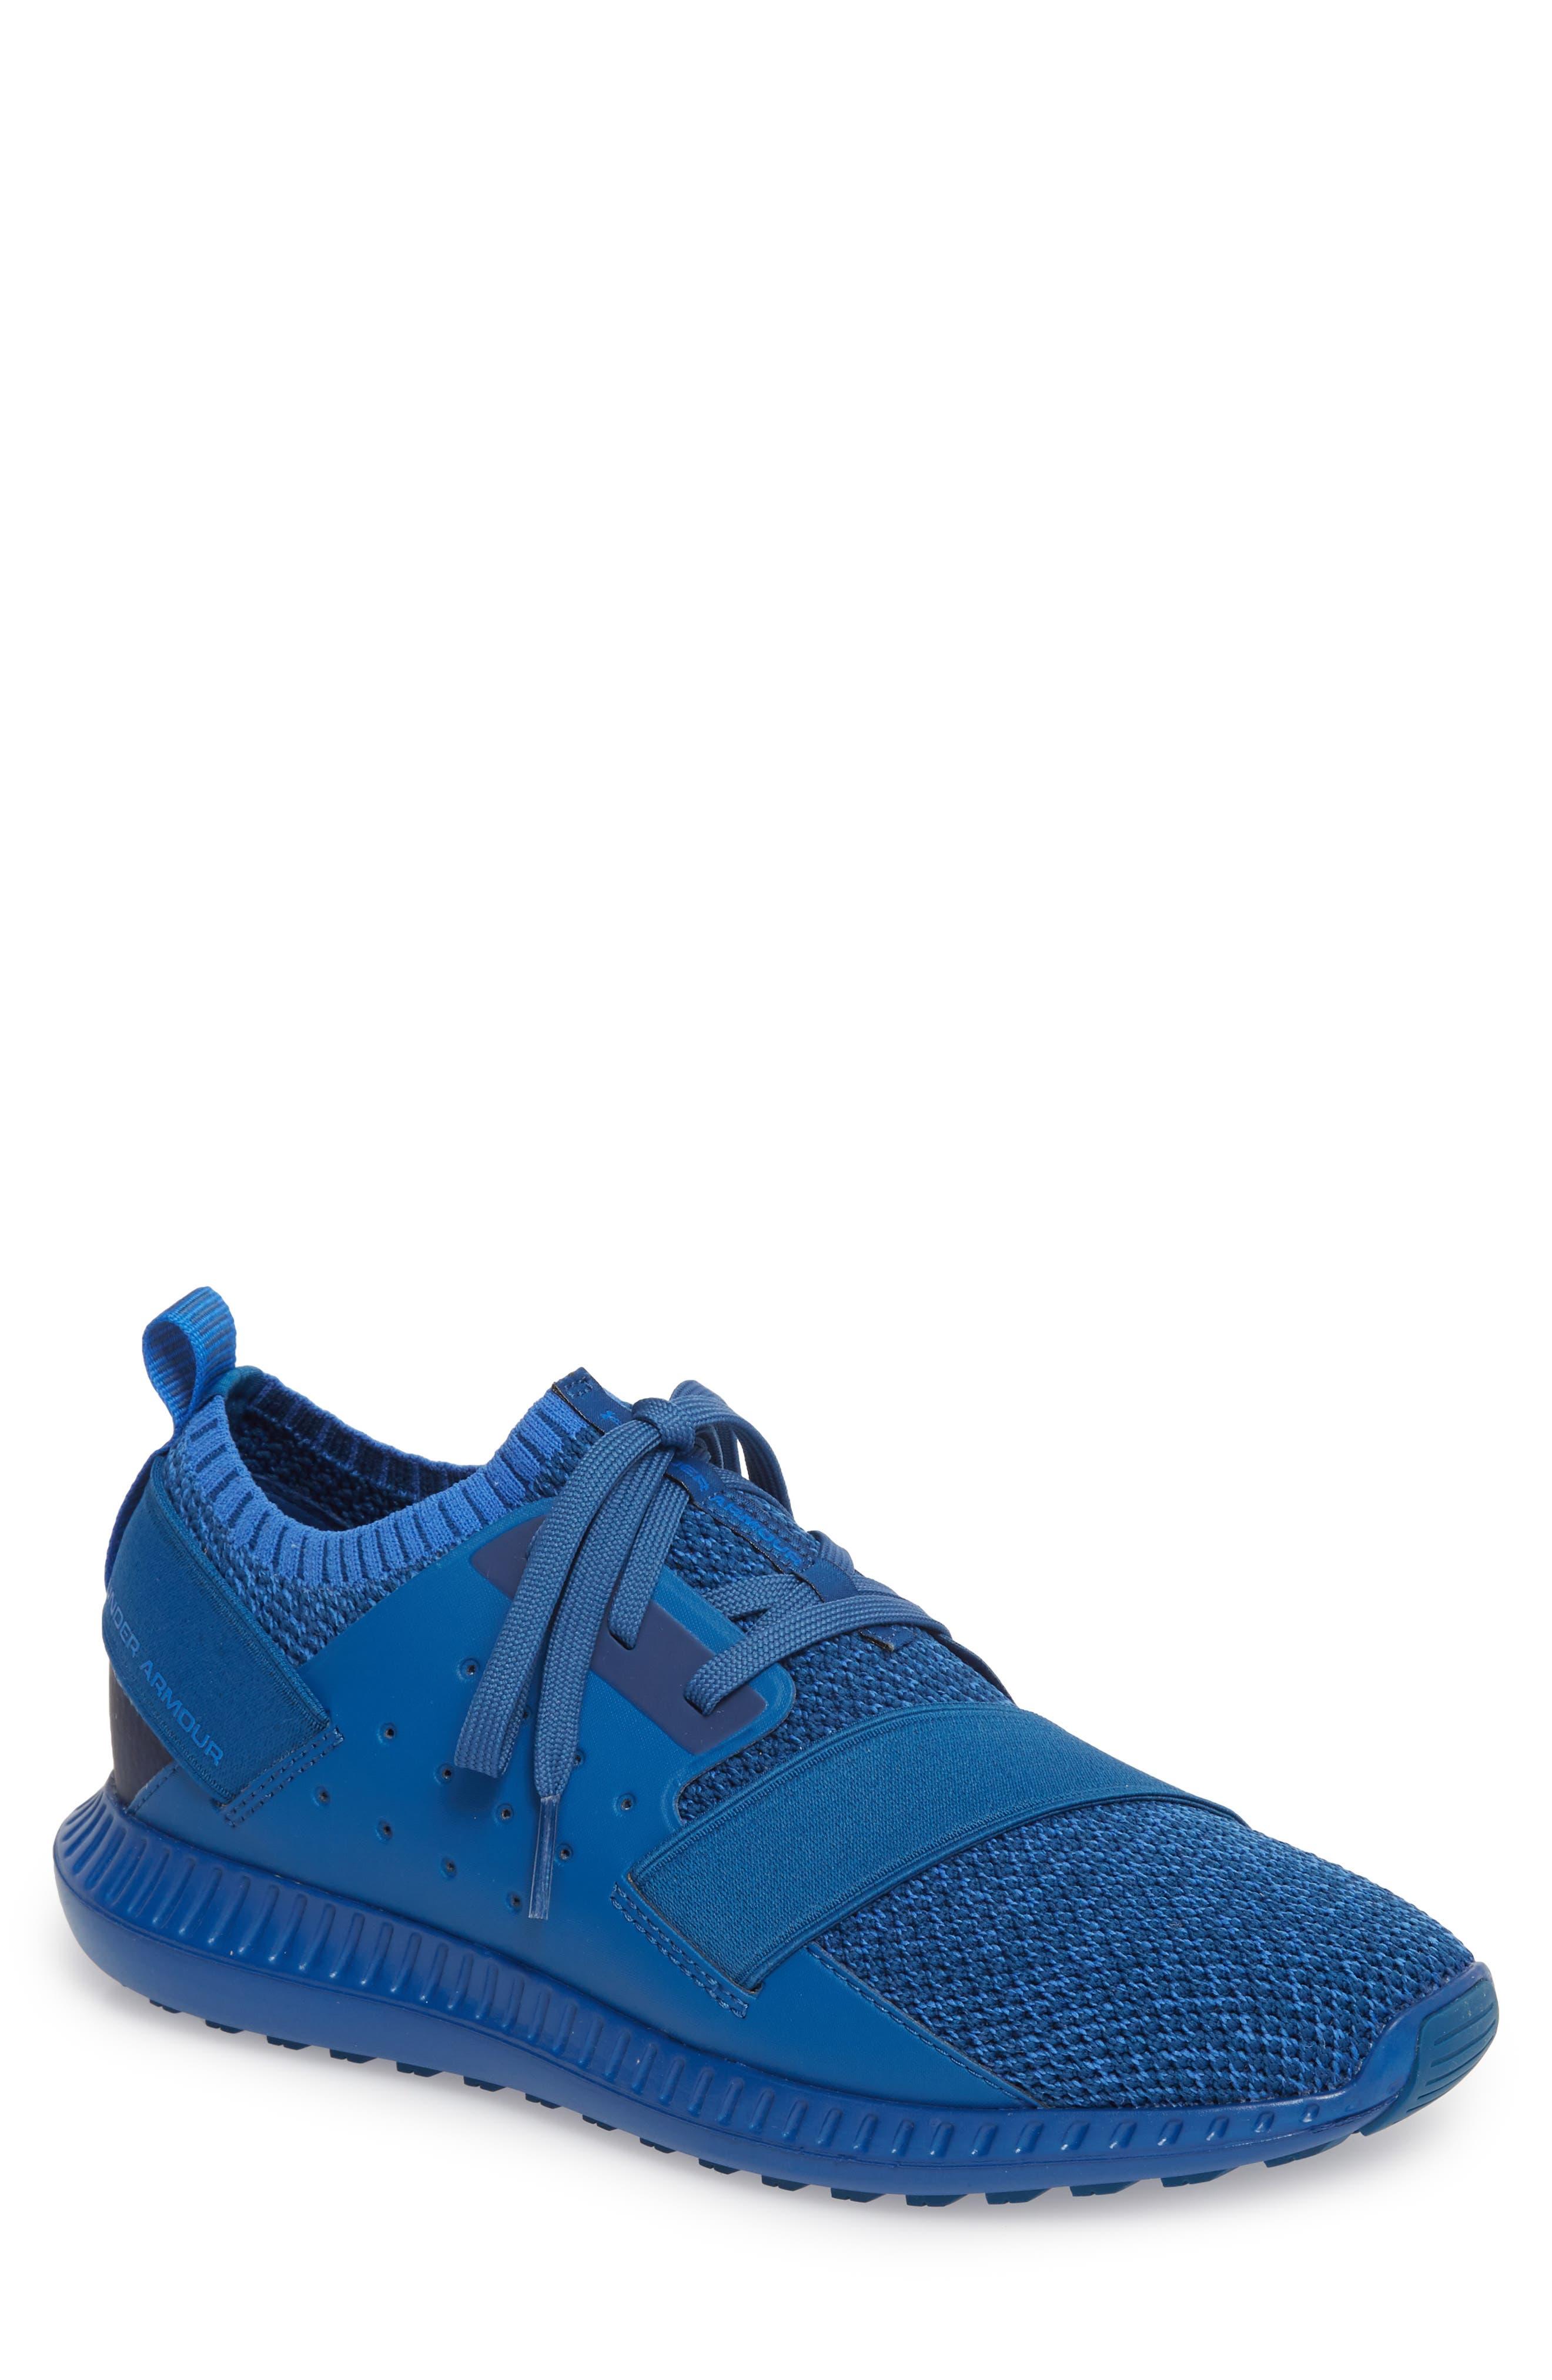 Threadborne Shift Sneaker,                             Main thumbnail 1, color,                             Blue / Mediterranean